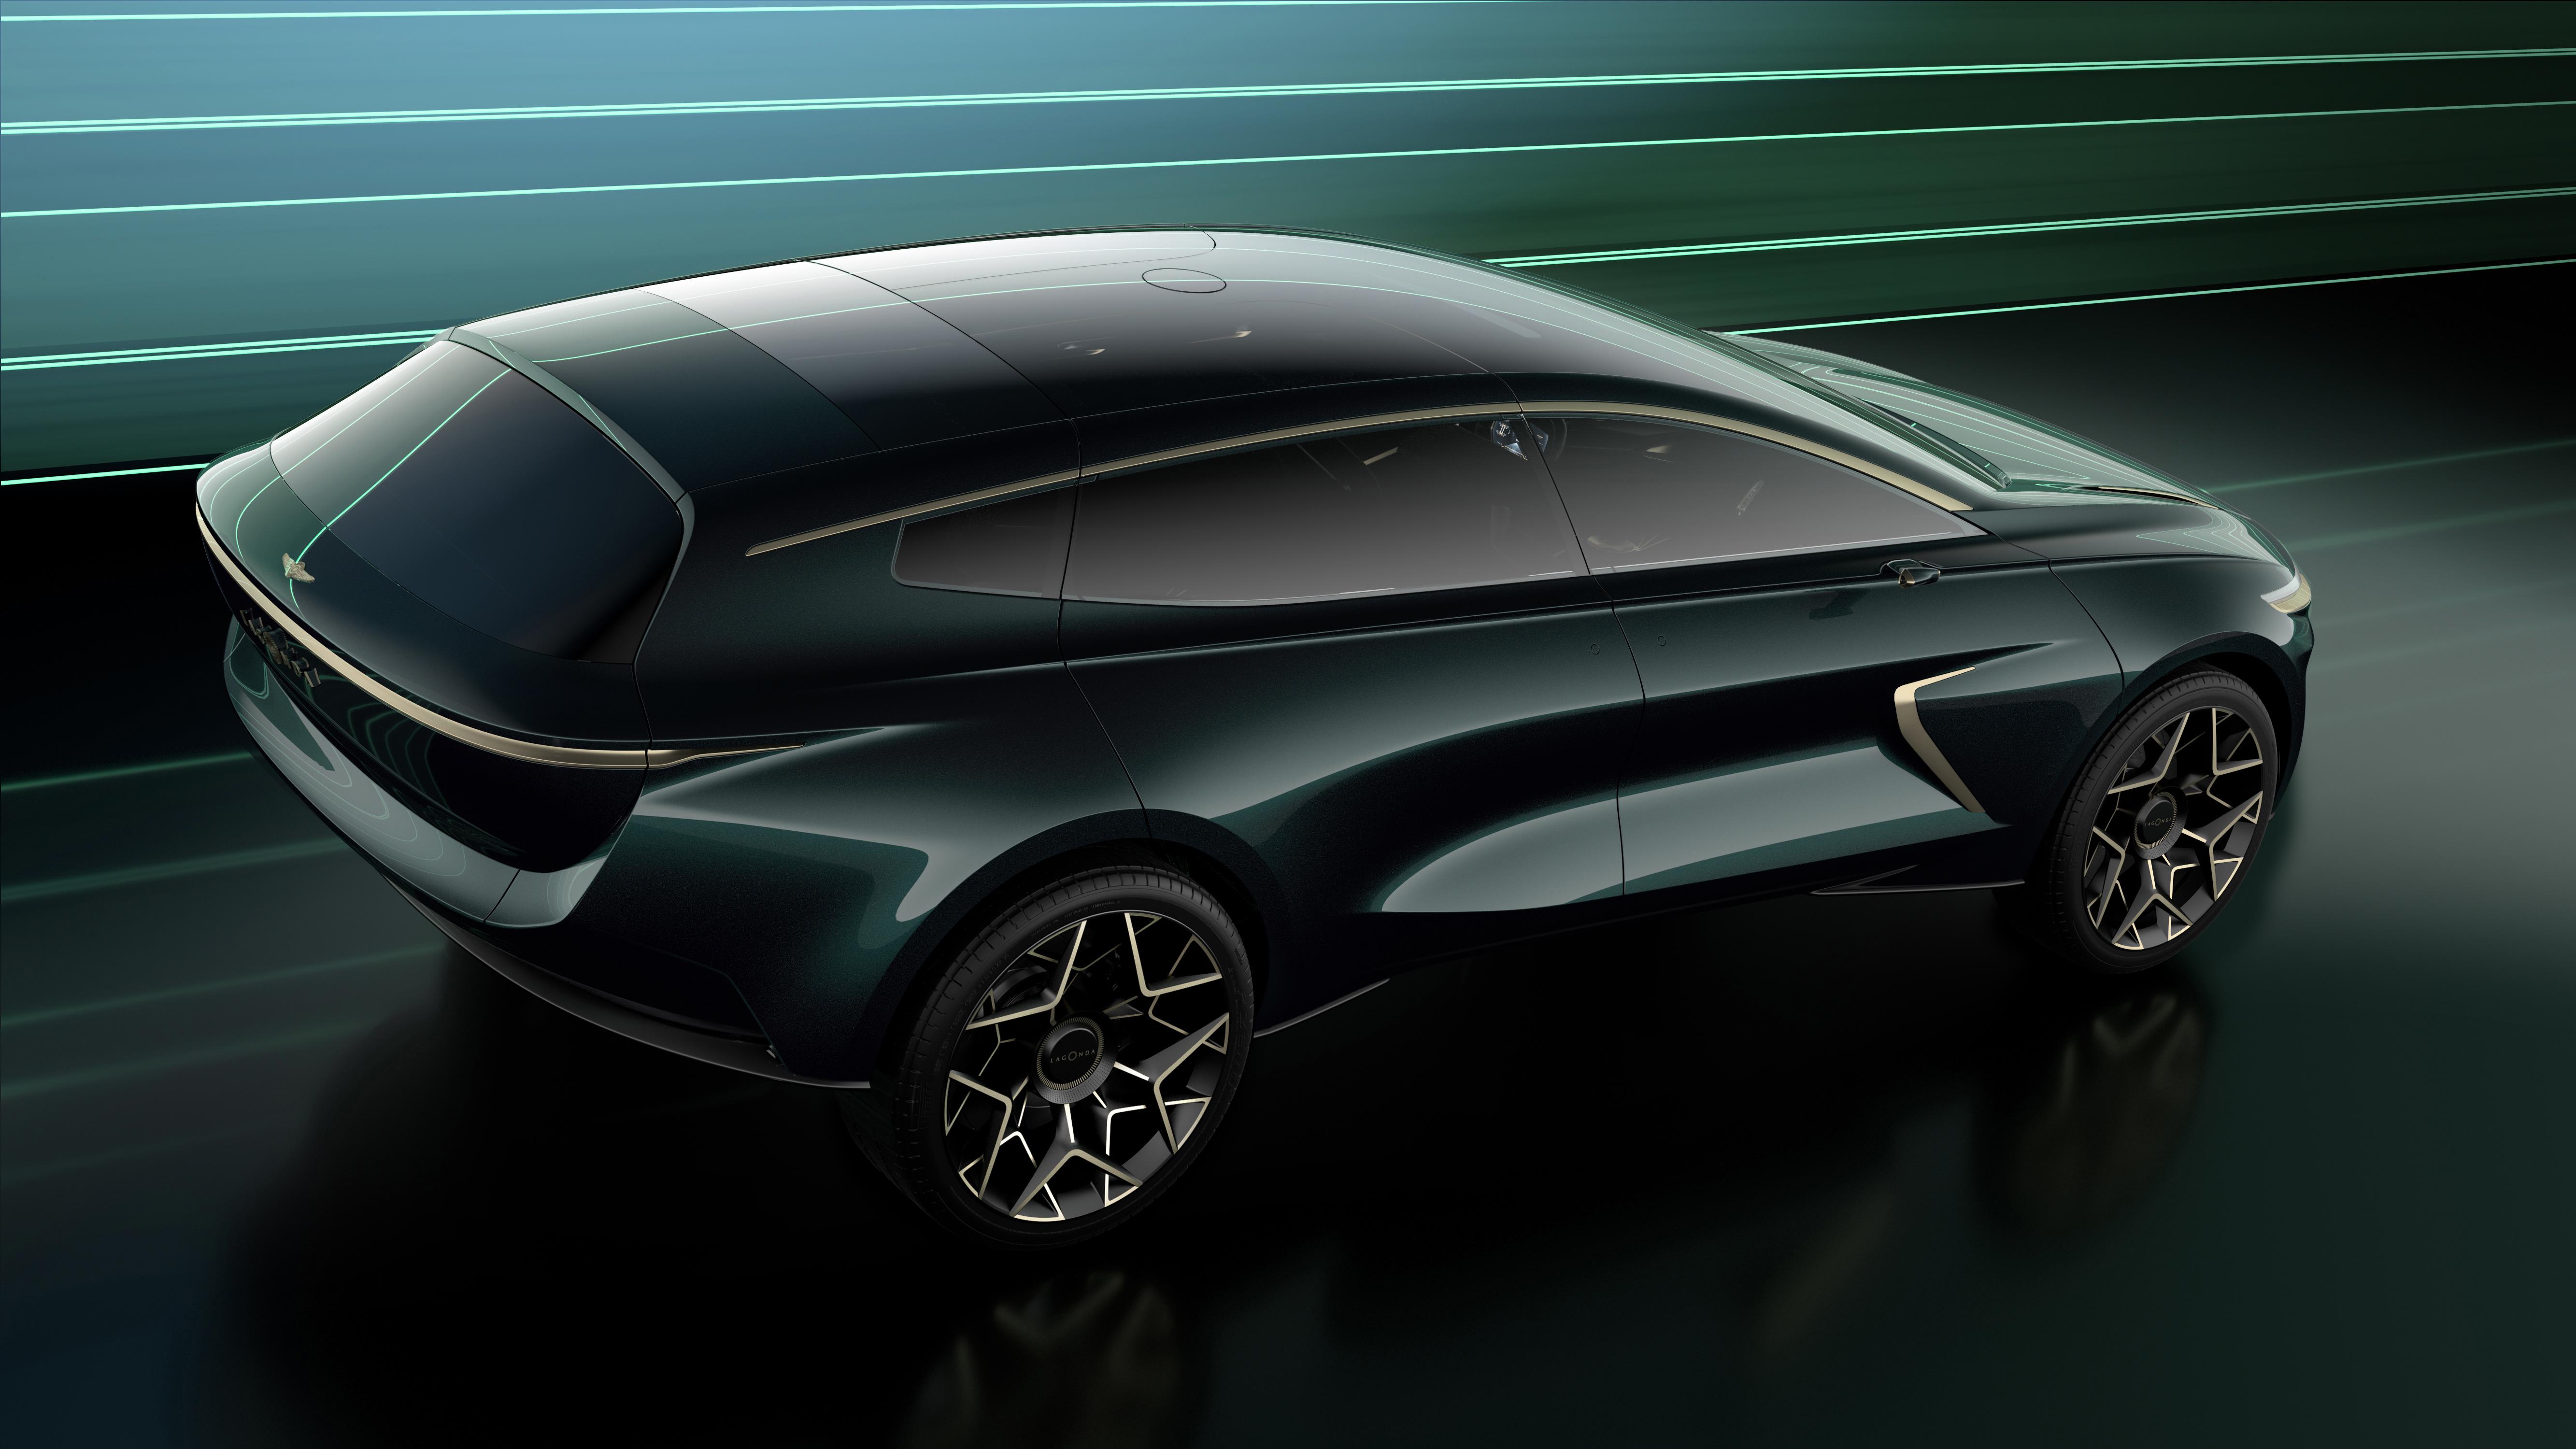 Aston Martin Reveals Lagonda All Terrain Electric Suv Concept Electrek